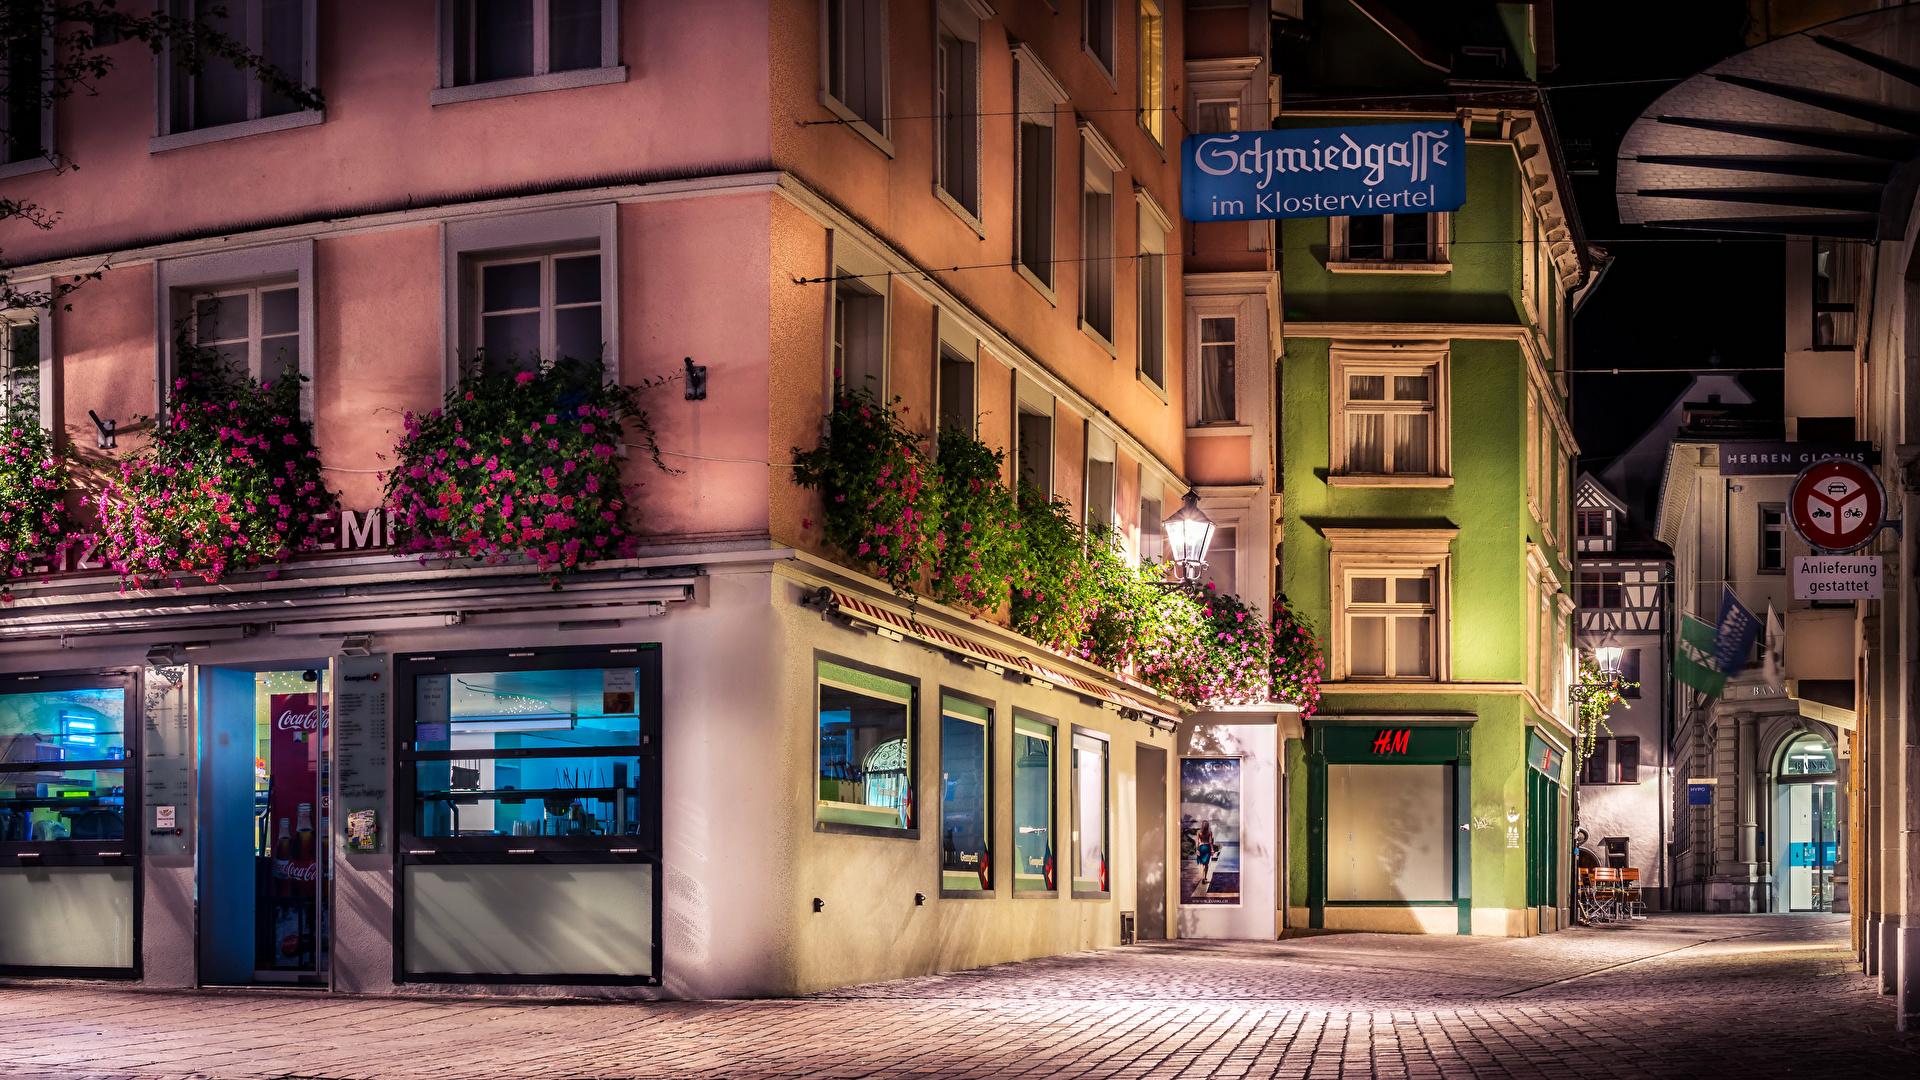 Wallpaper Switzerland St.Gallen HDRI Street night time Street lights Cities Building 1920x1080 HDR Night Houses